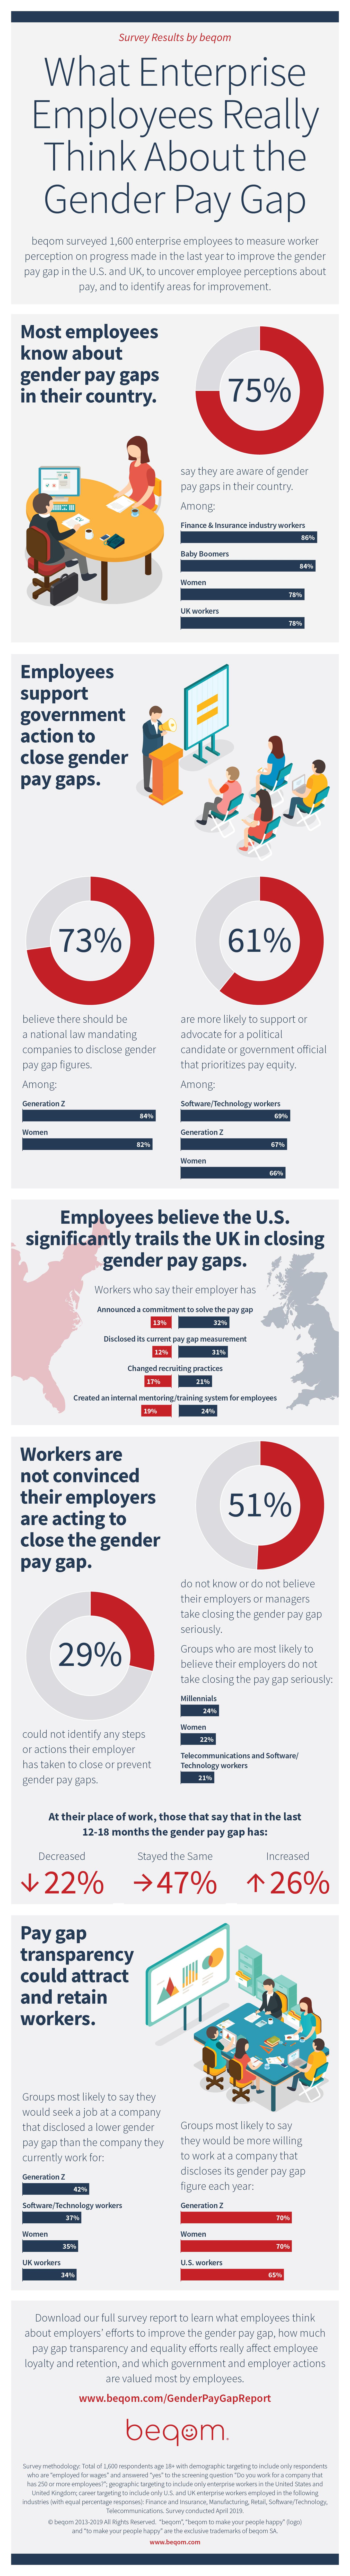 Gender_Pay_Gap_Infographic_v3